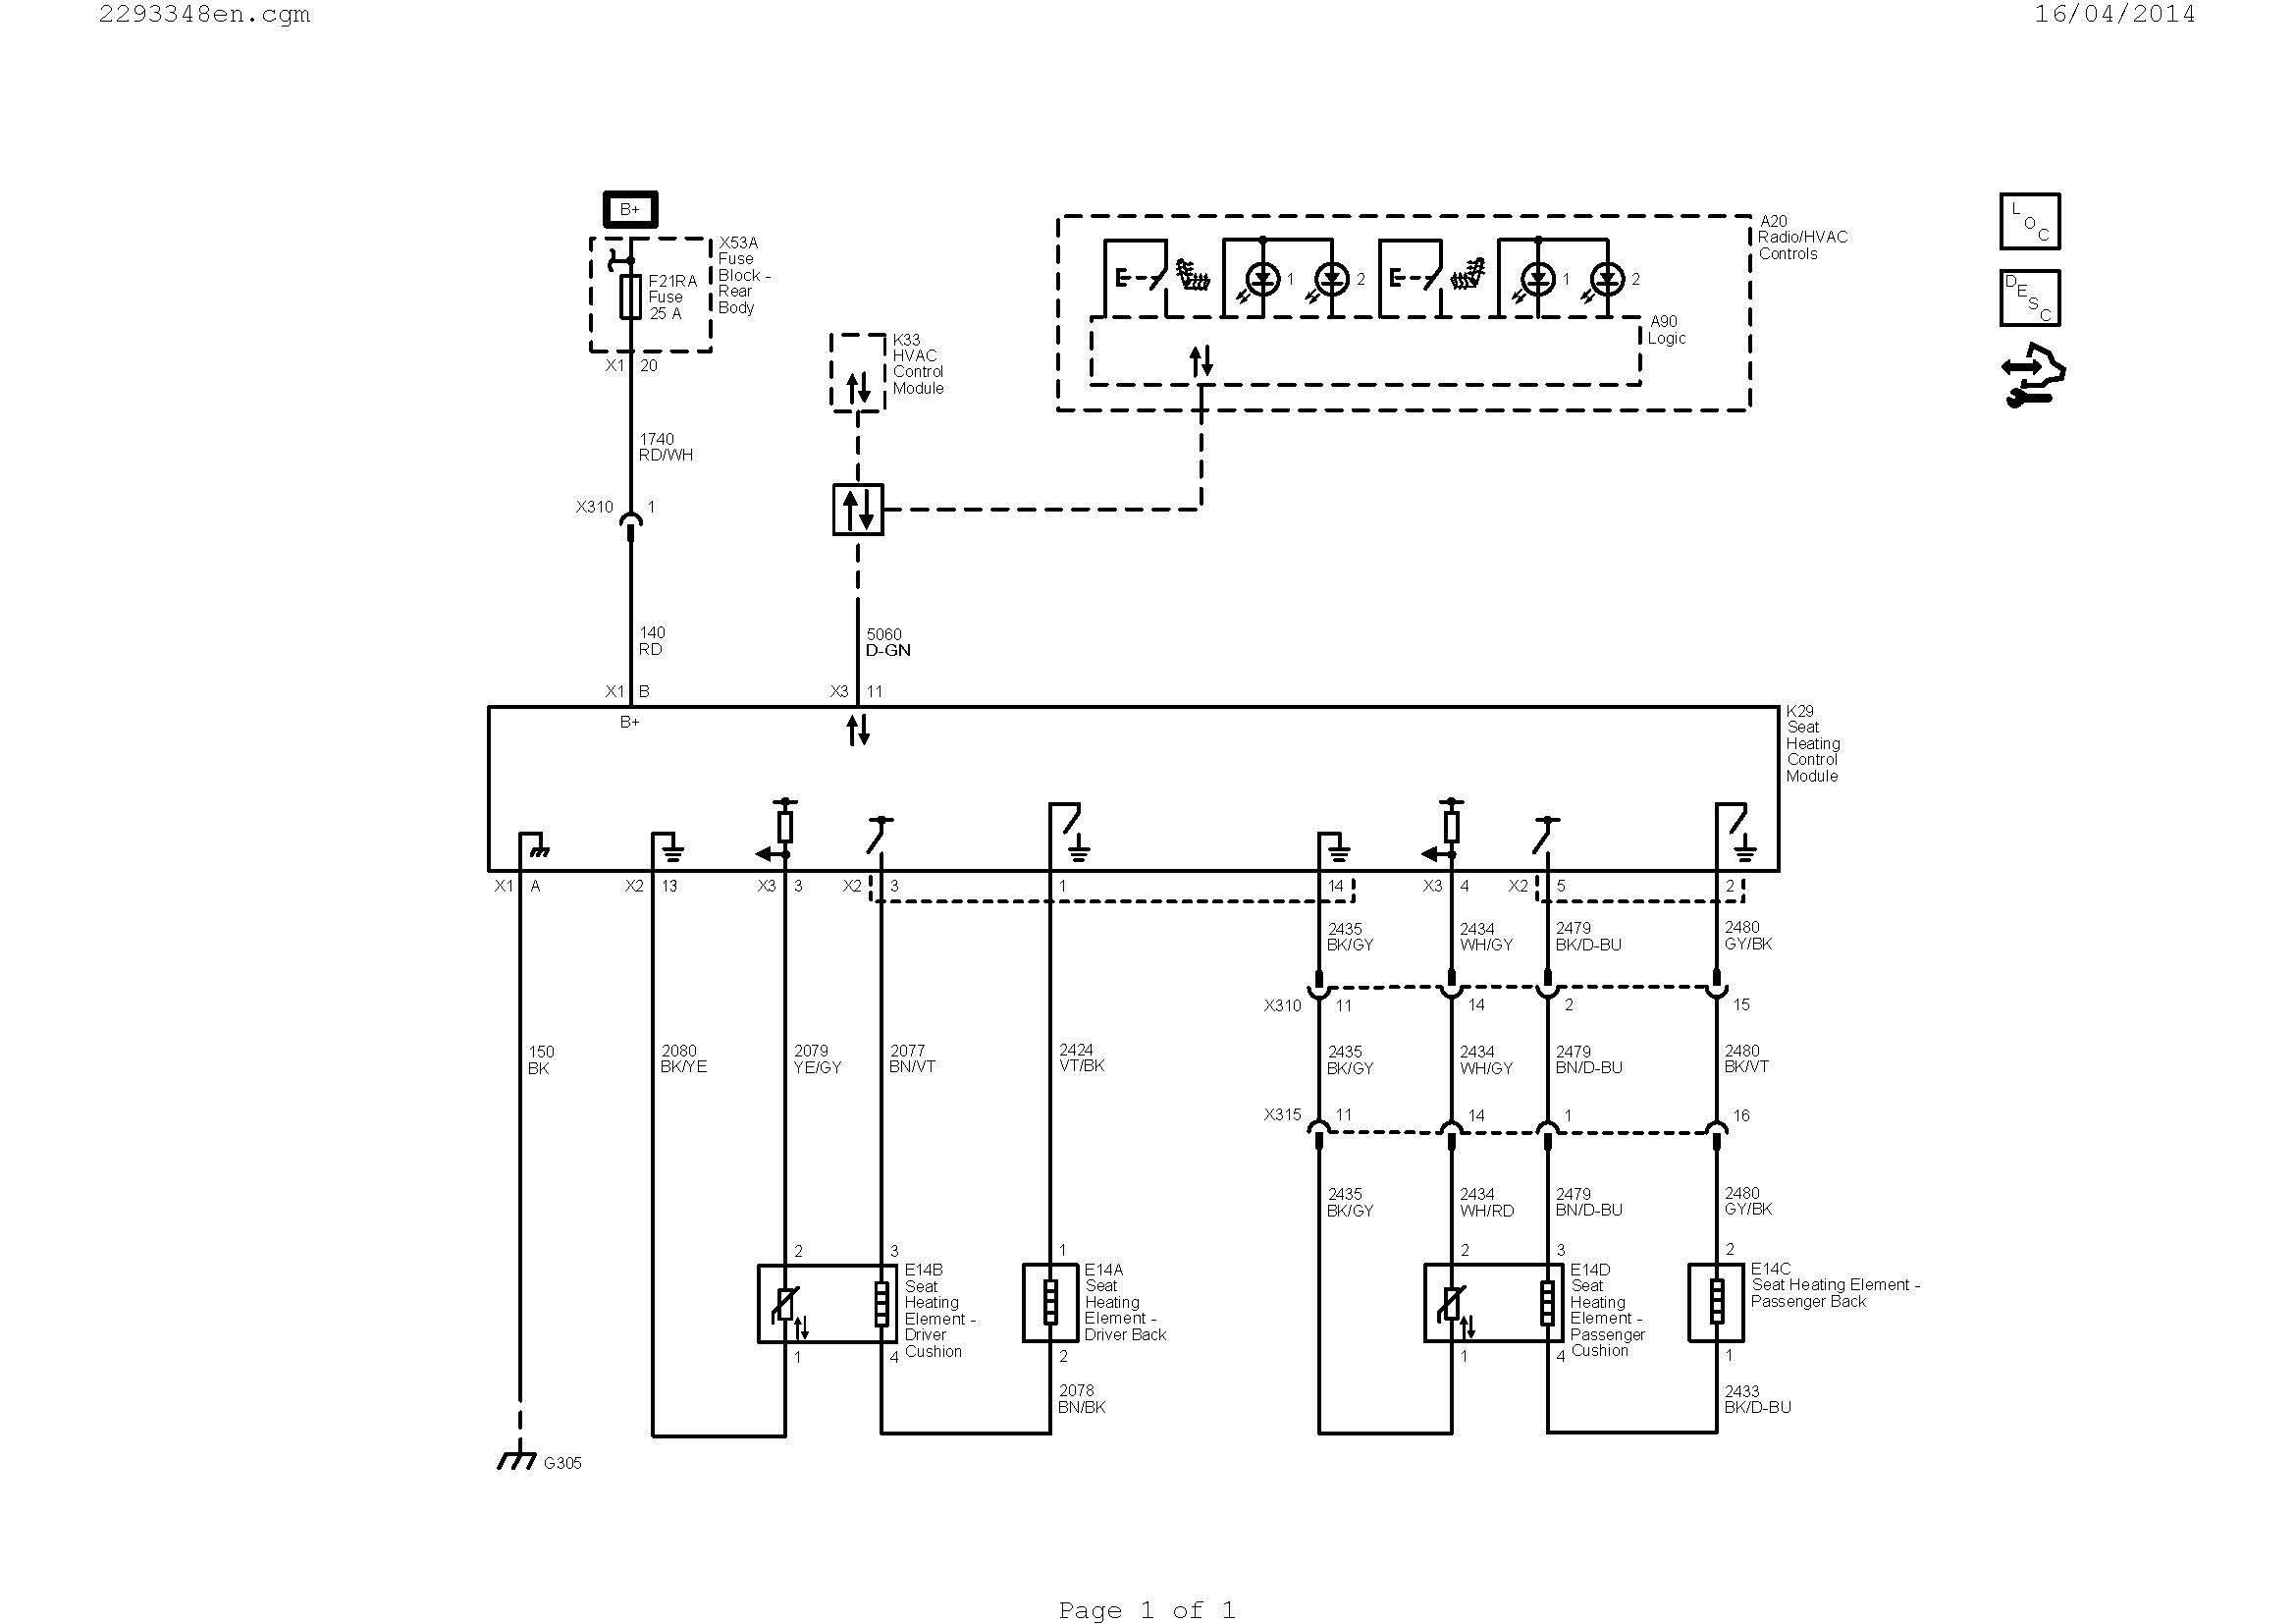 generator inlet box wiring diagram Collection-thermostat wiring diagram Collection Wiring A Ac Thermostat Diagram New Wiring Diagram Ac Valid Hvac DOWNLOAD Wiring Diagram 13-g